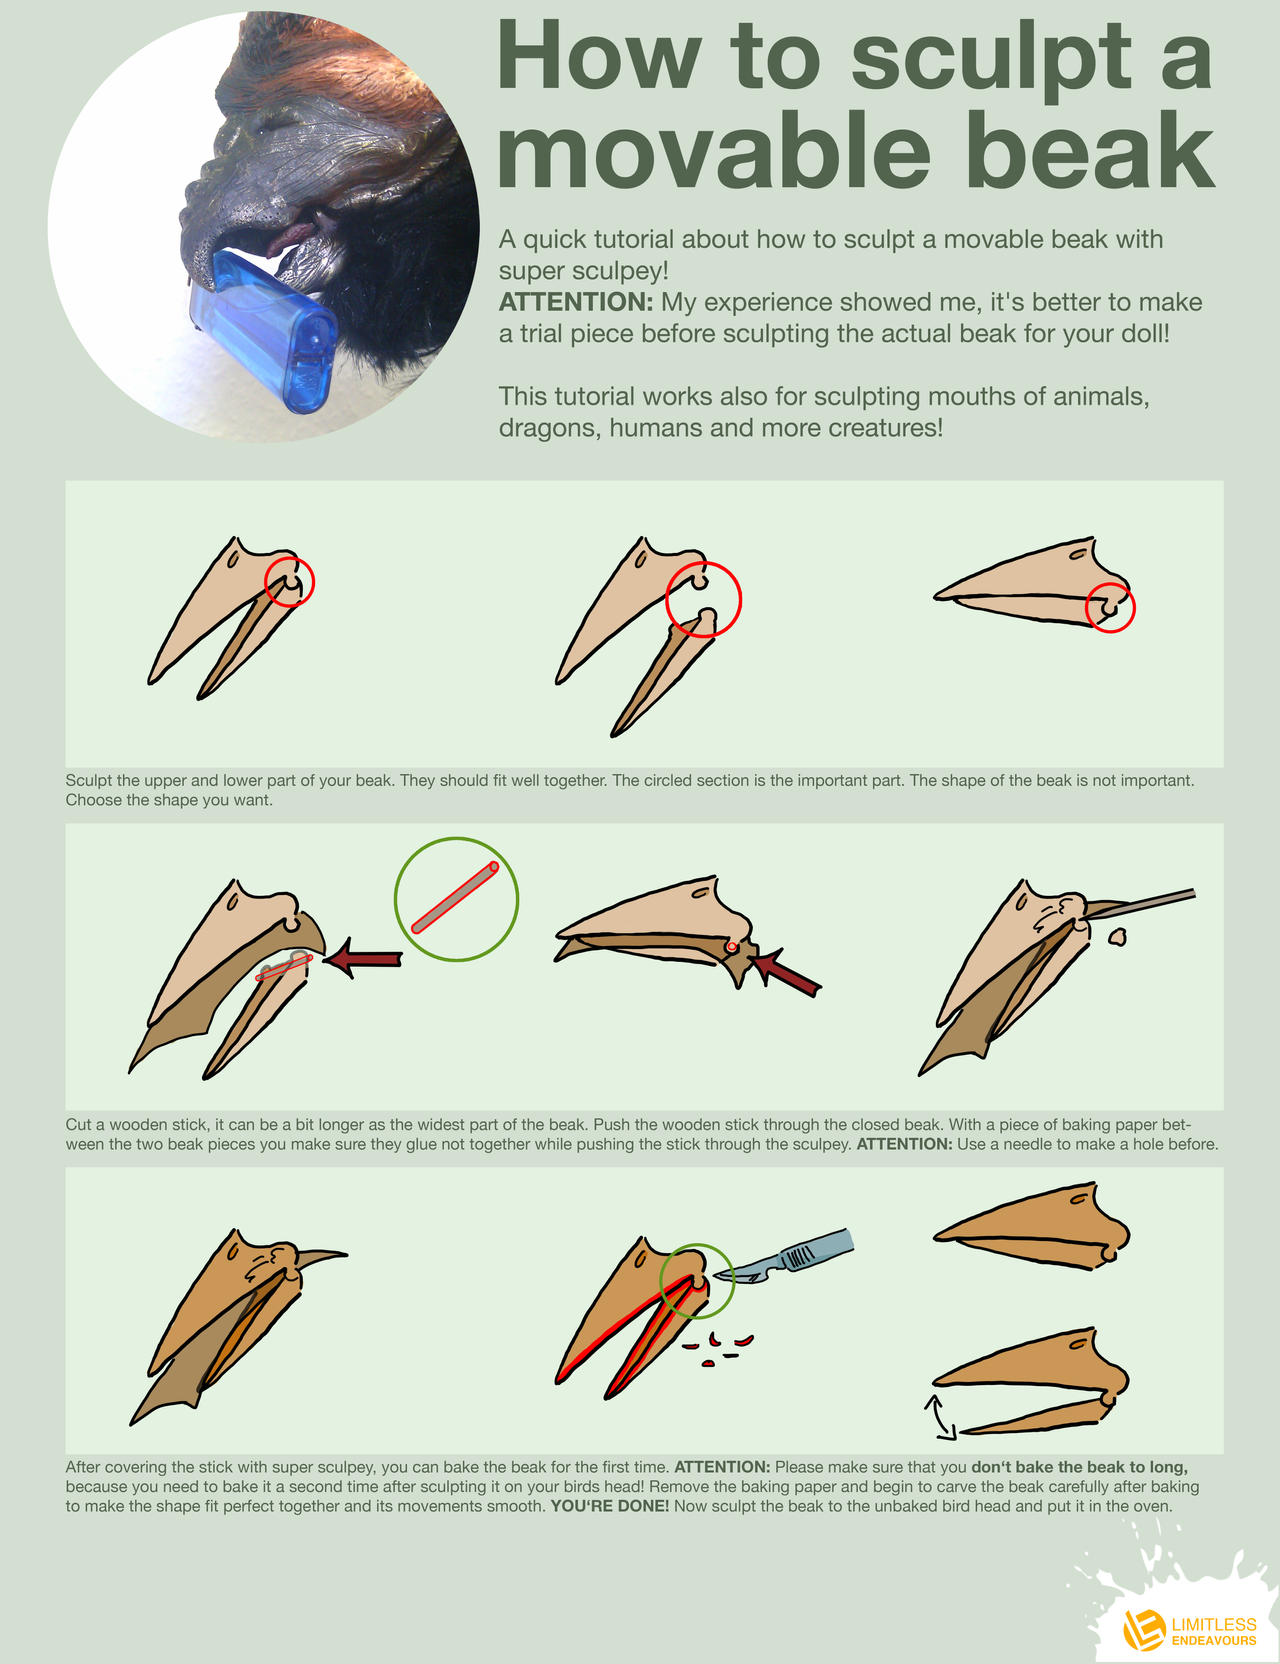 How to sculpt a movable beak